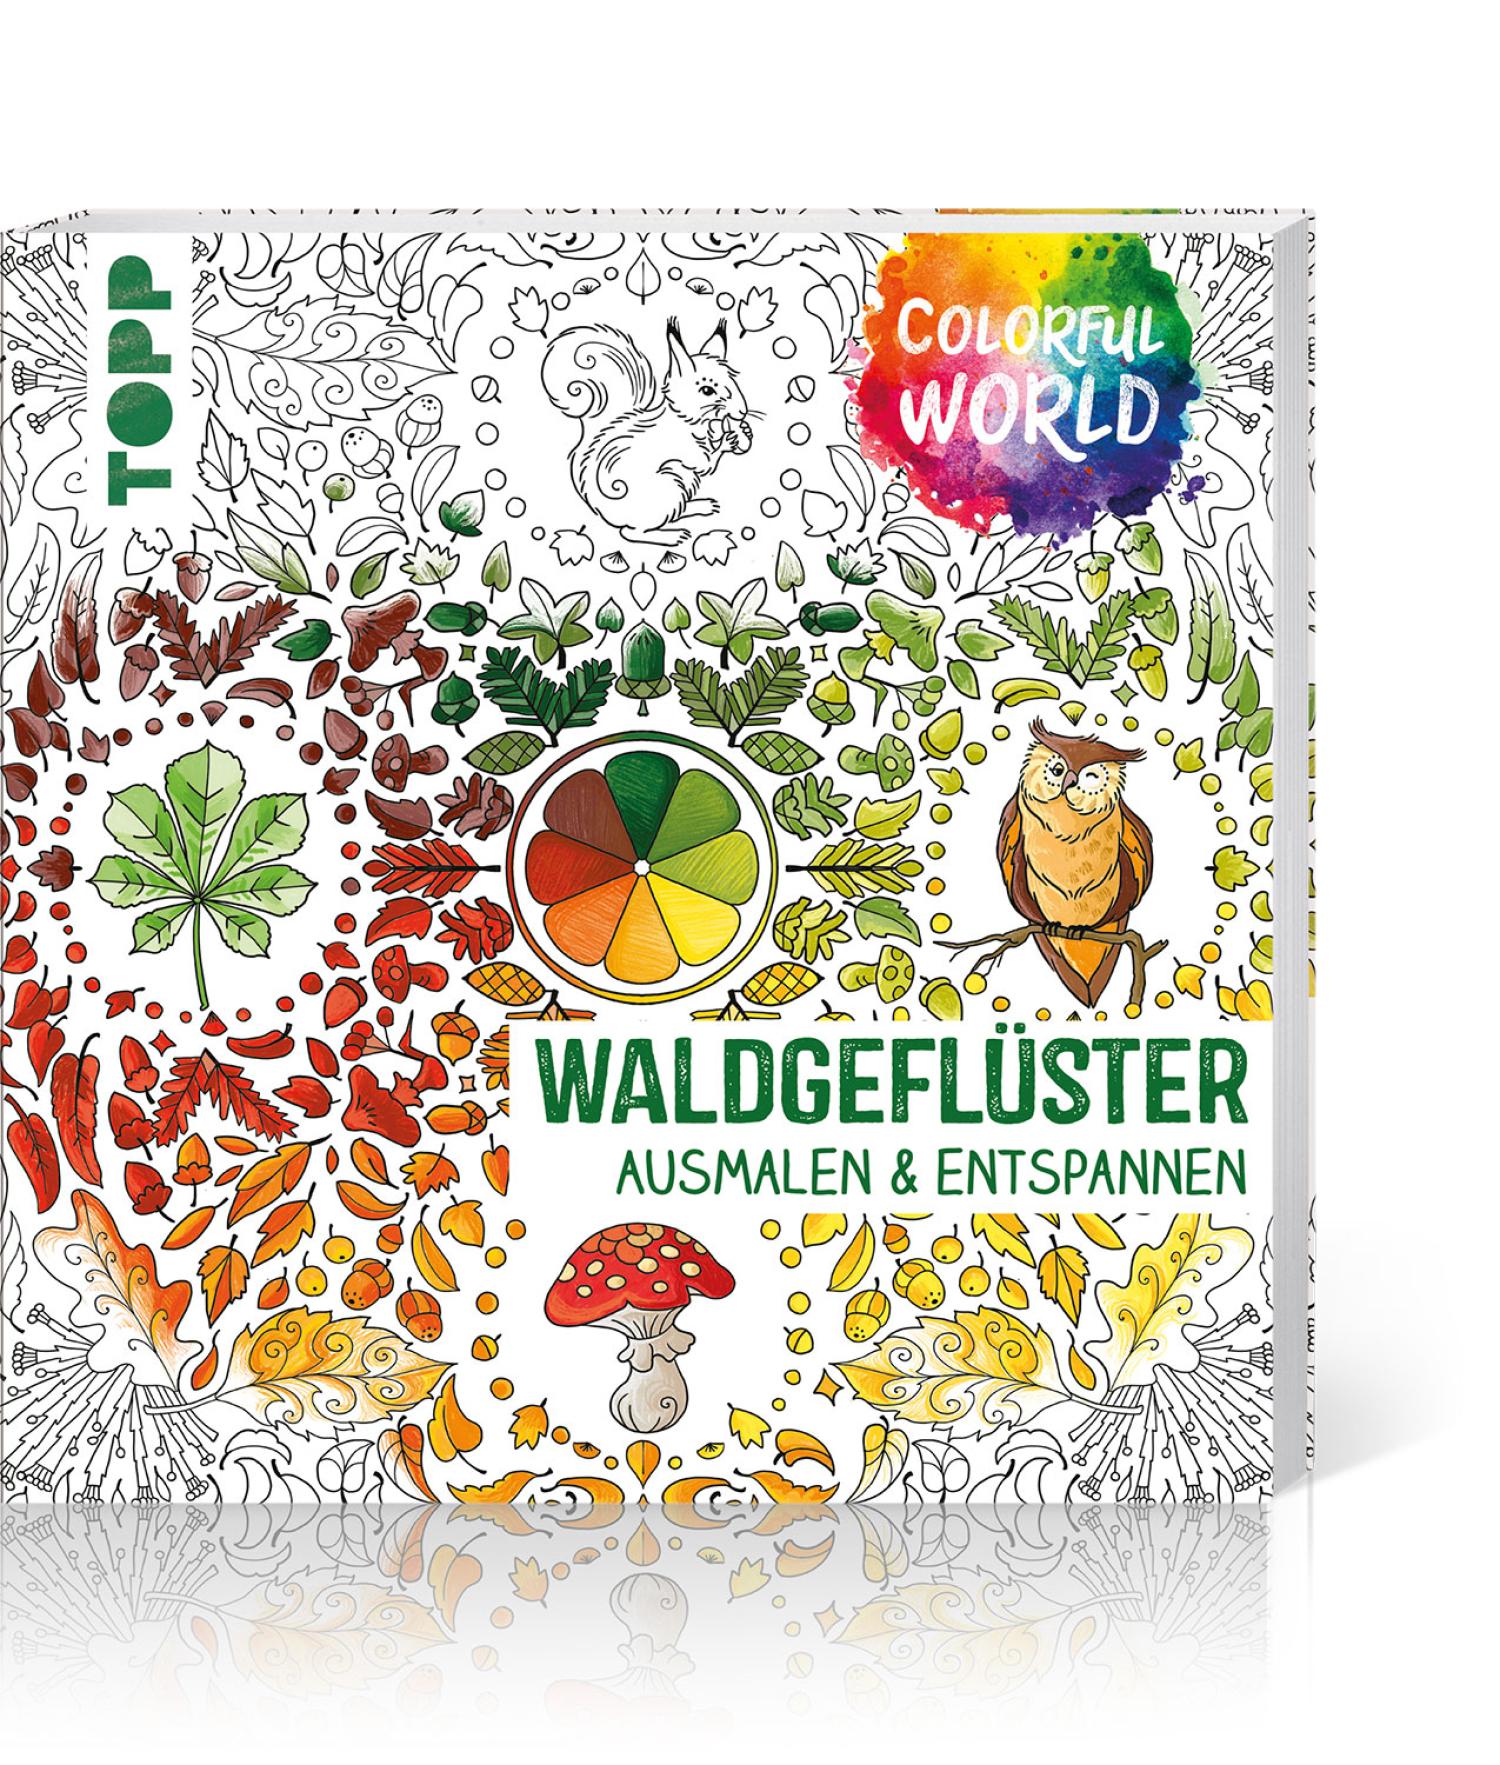 Colorful World – Waldgeflüster, Produktbild 1